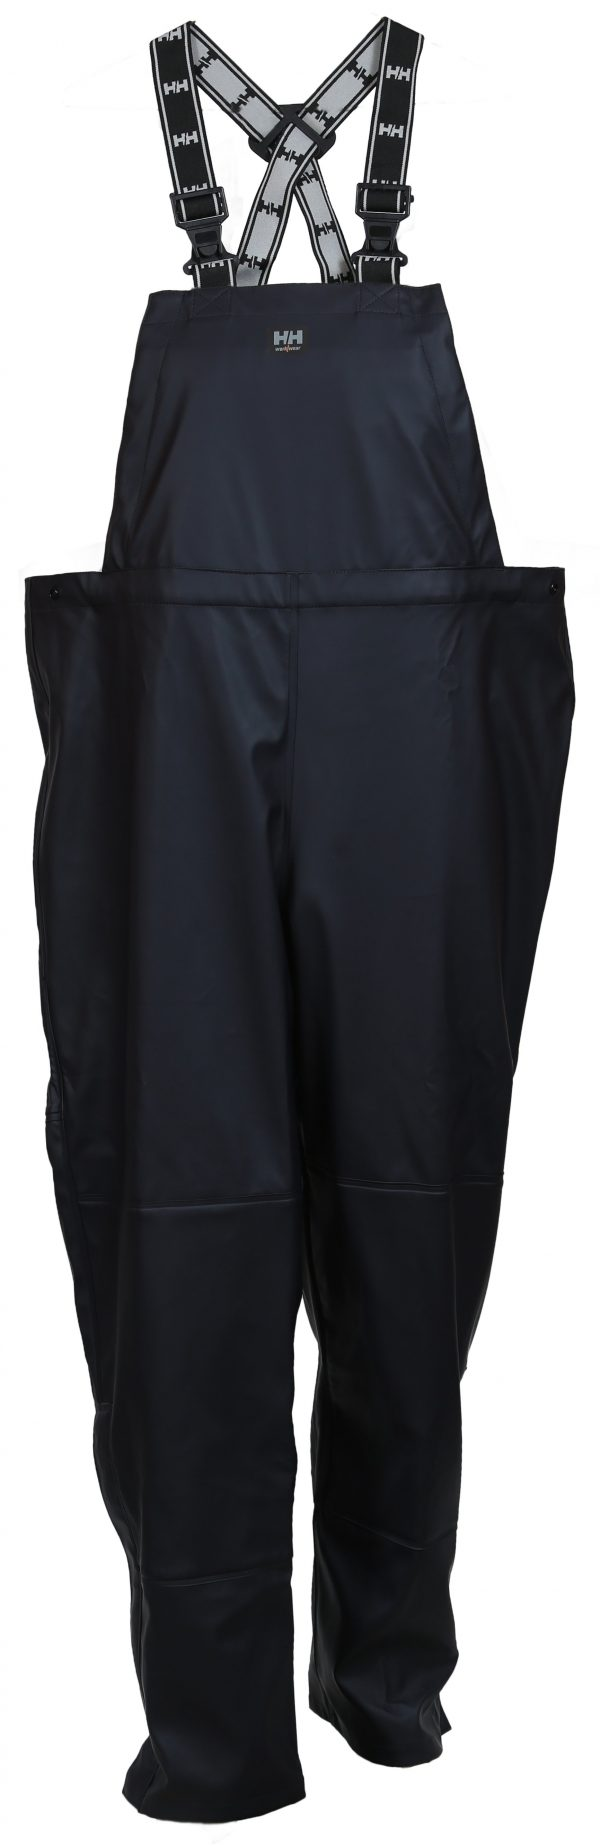 70548 Helly Hansen Men's Impertech™ Double-layer Reinforced Rain Pant w/ Internal Chest Pocket, Classic Navy